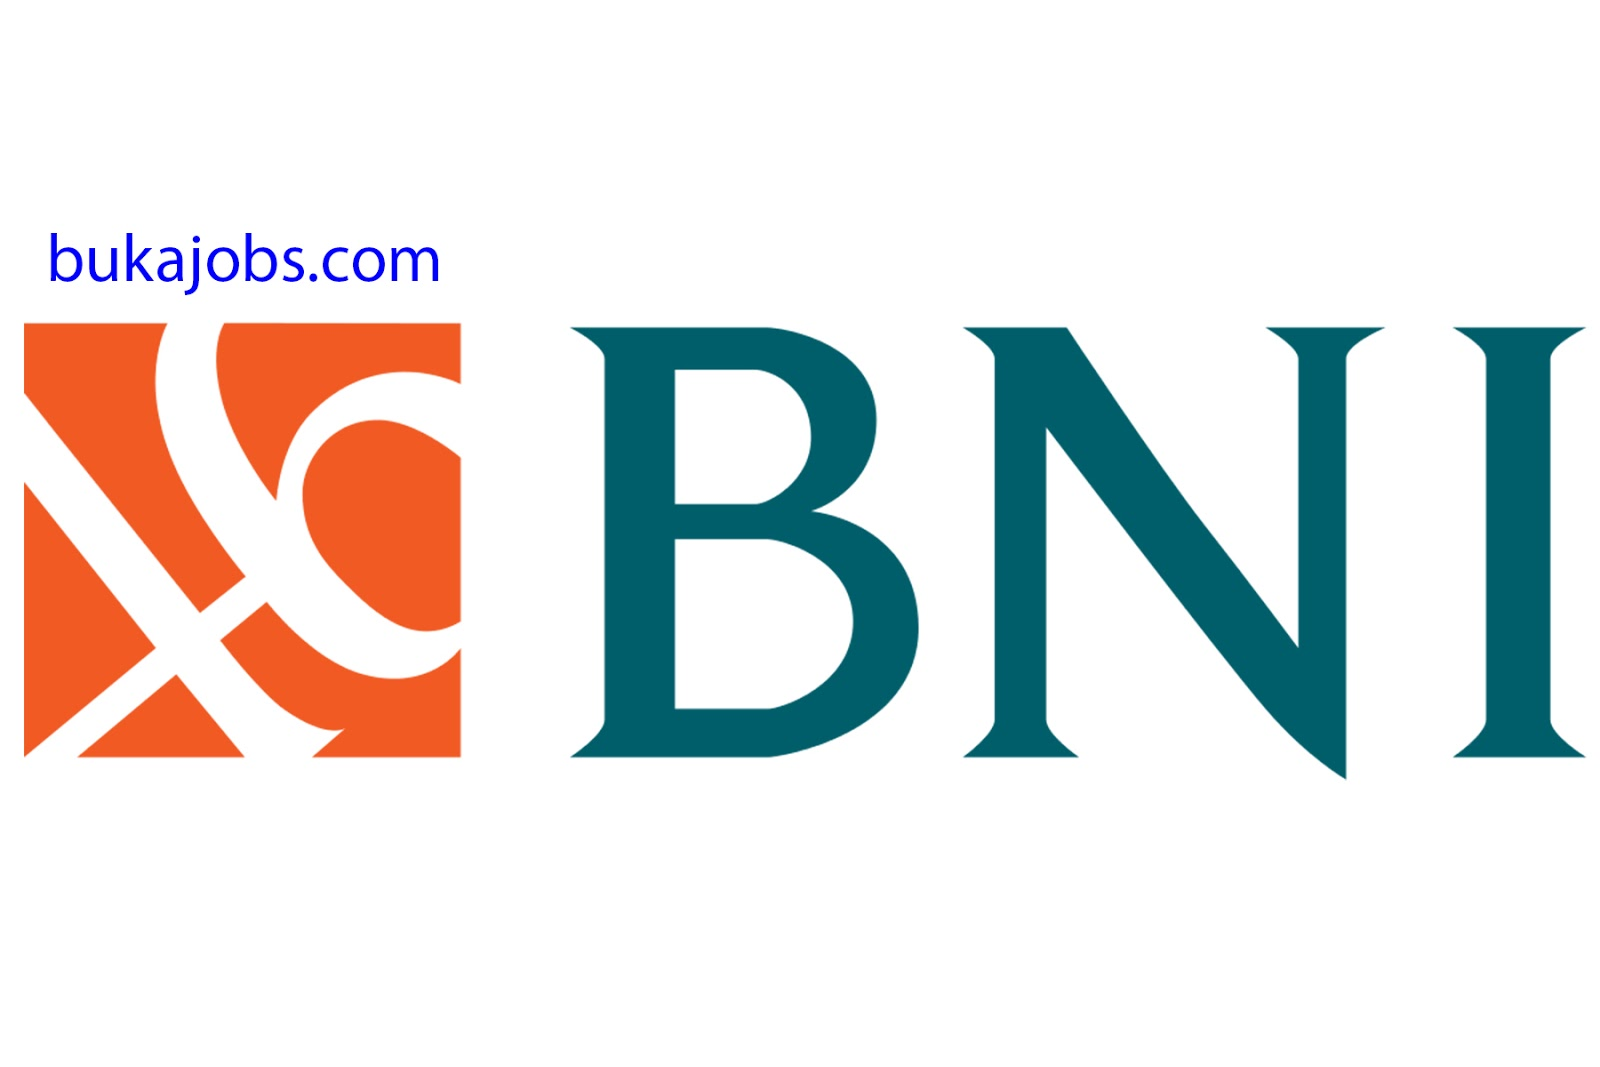 Lowongan Kerja PT. Bank Negara Indonesia (Persero) Tbk 2019